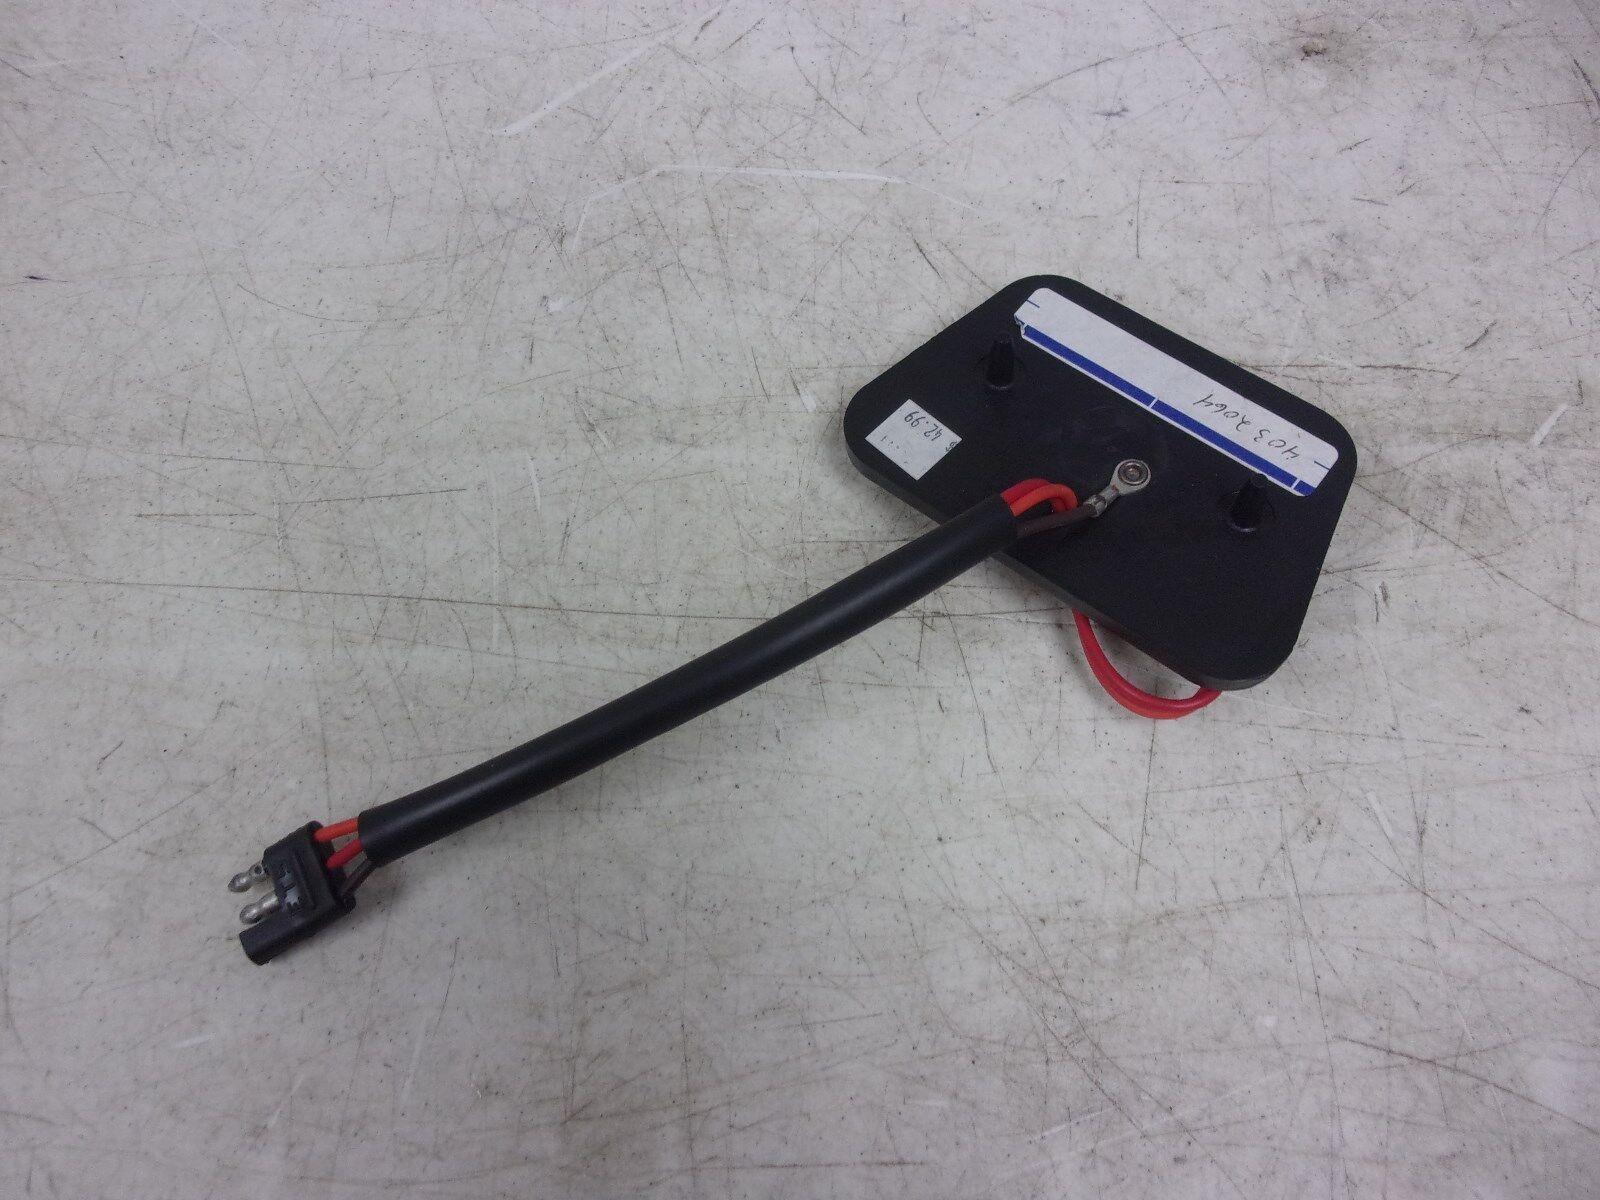 Polaris Snowmobile Backing Taillight 4032064